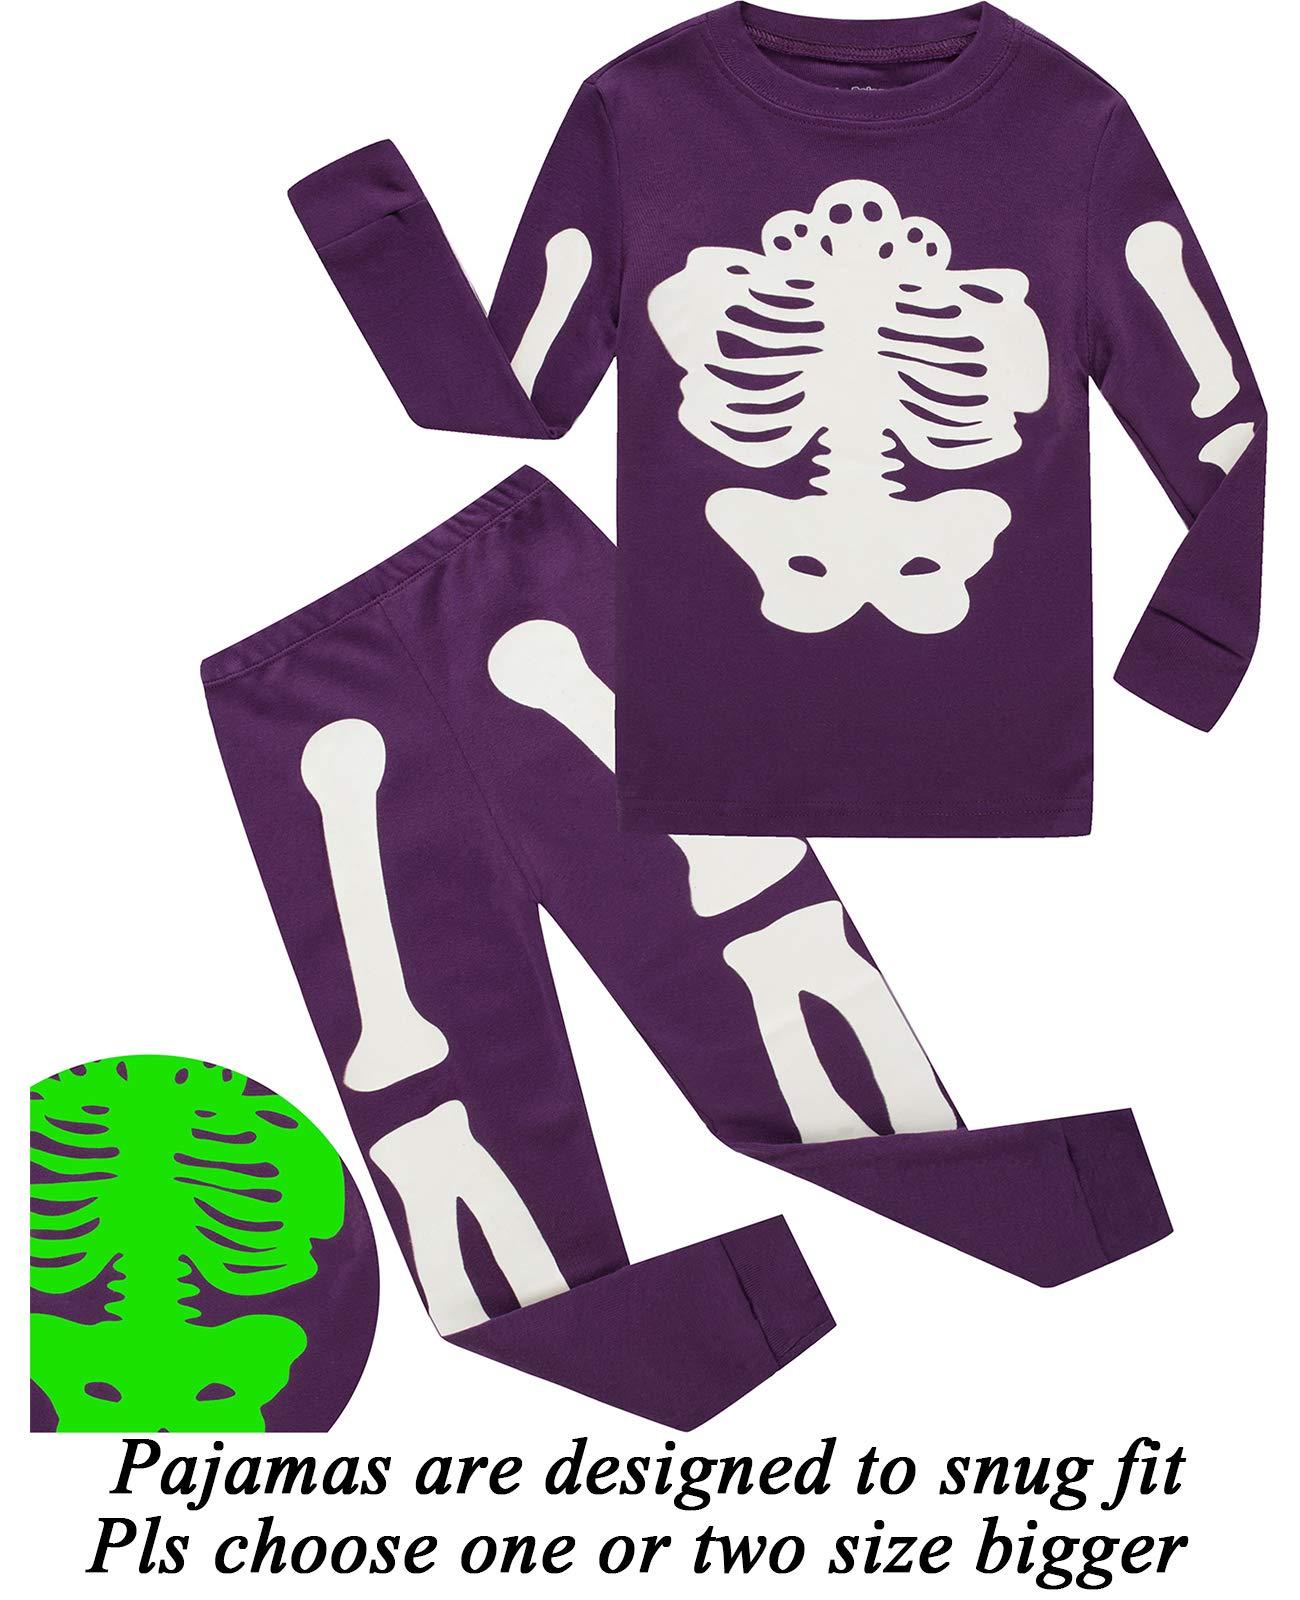 boys halloween pajamas skeleton glow in the dark shirts toddler pjs kids clothes sleepwear 2t